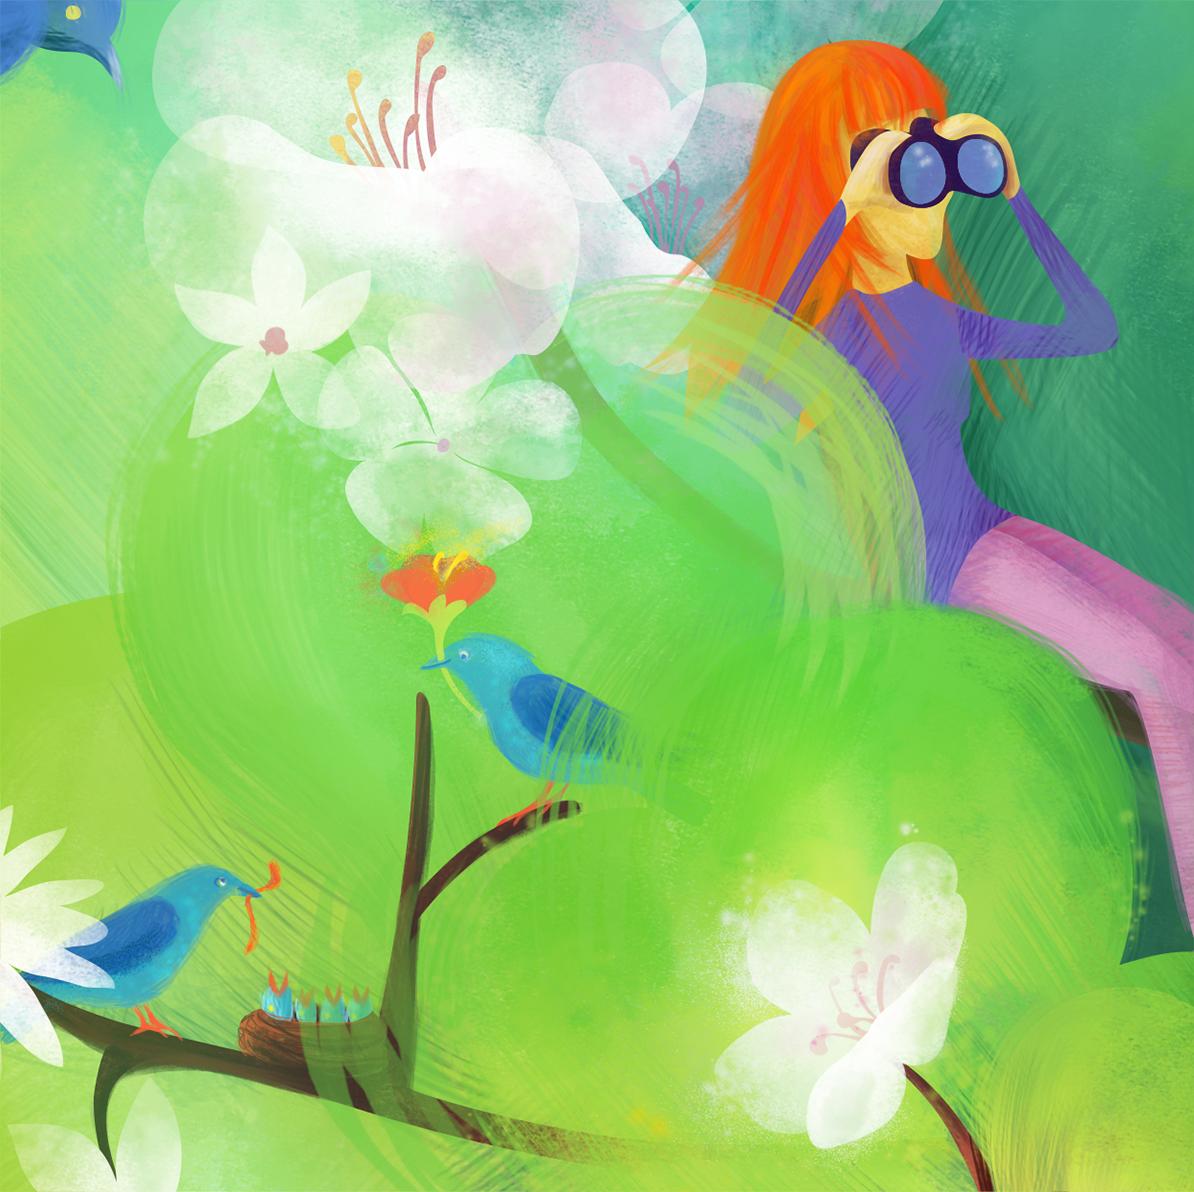 Illustration detail: Girl with binoculars